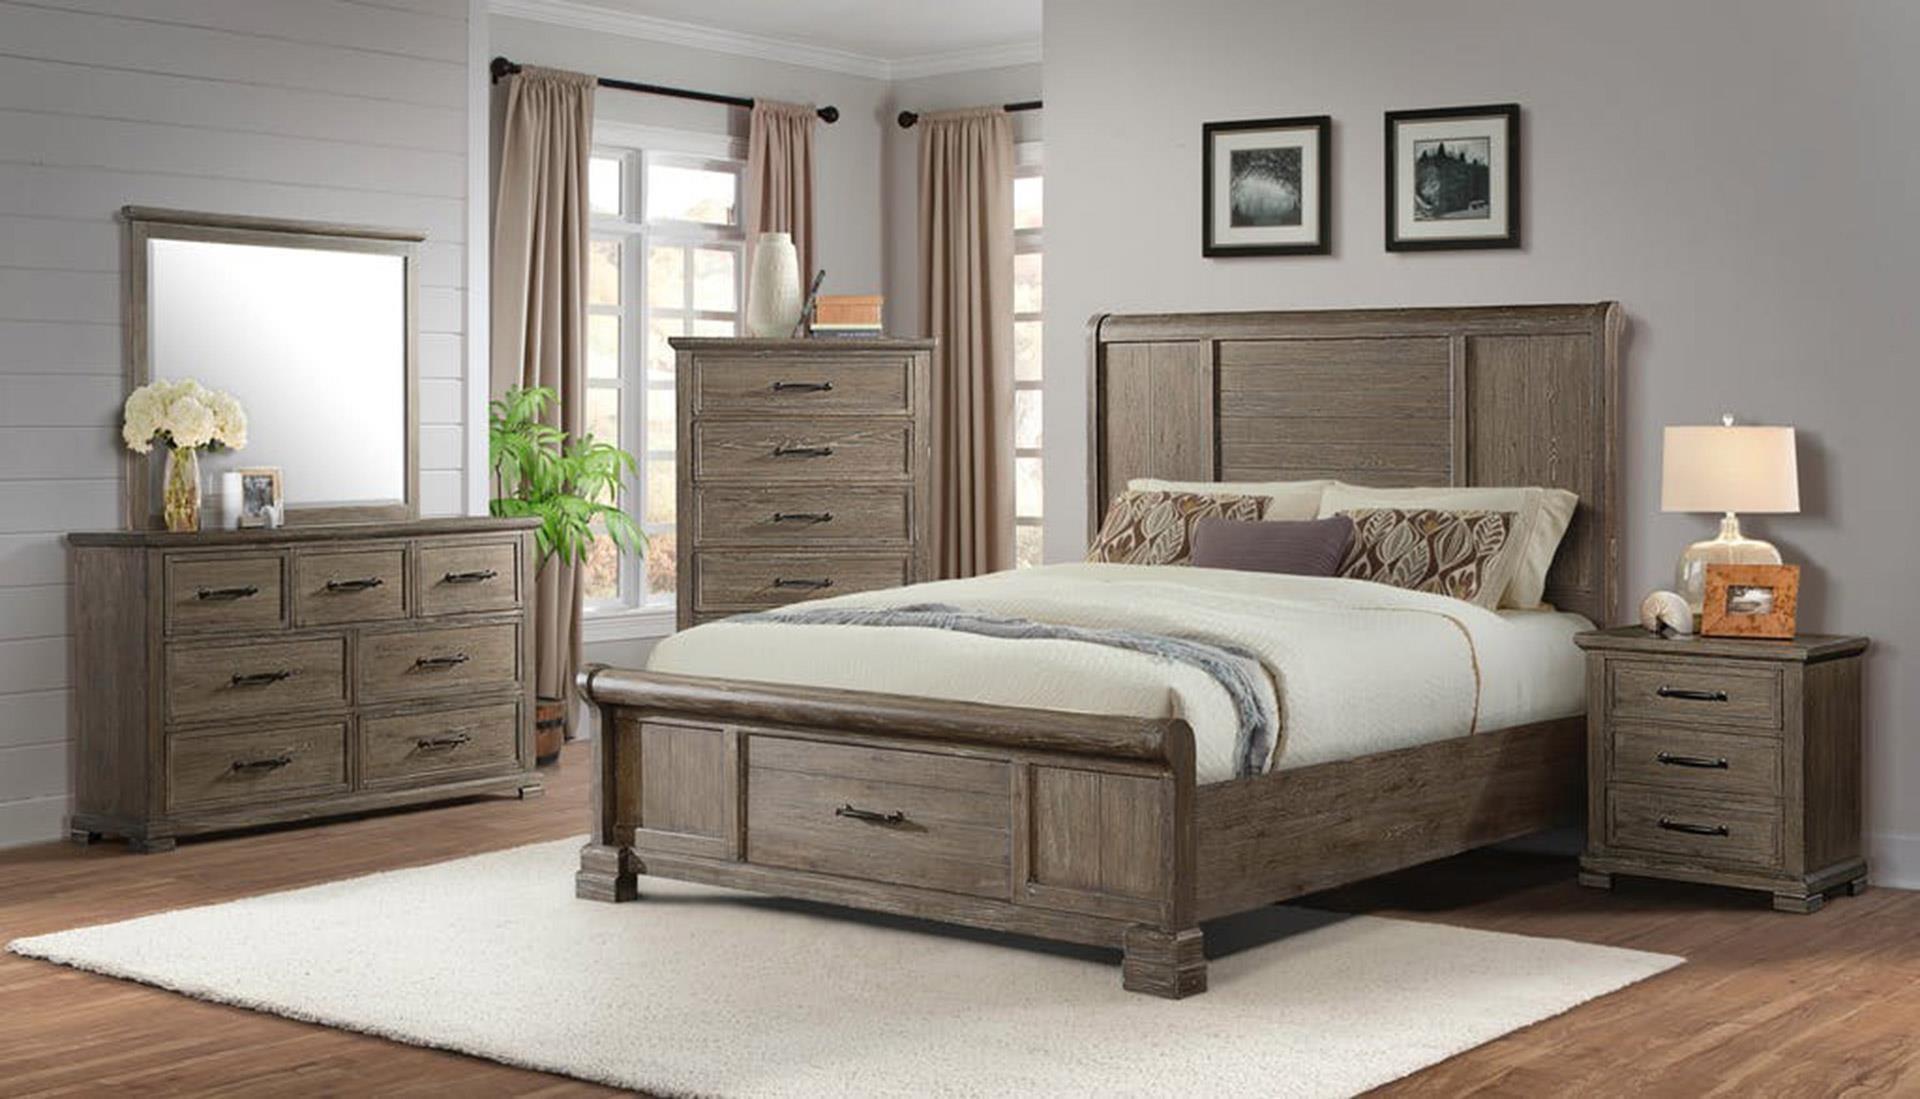 King Storage Bed, Dresser, Mirror, and Nightstand